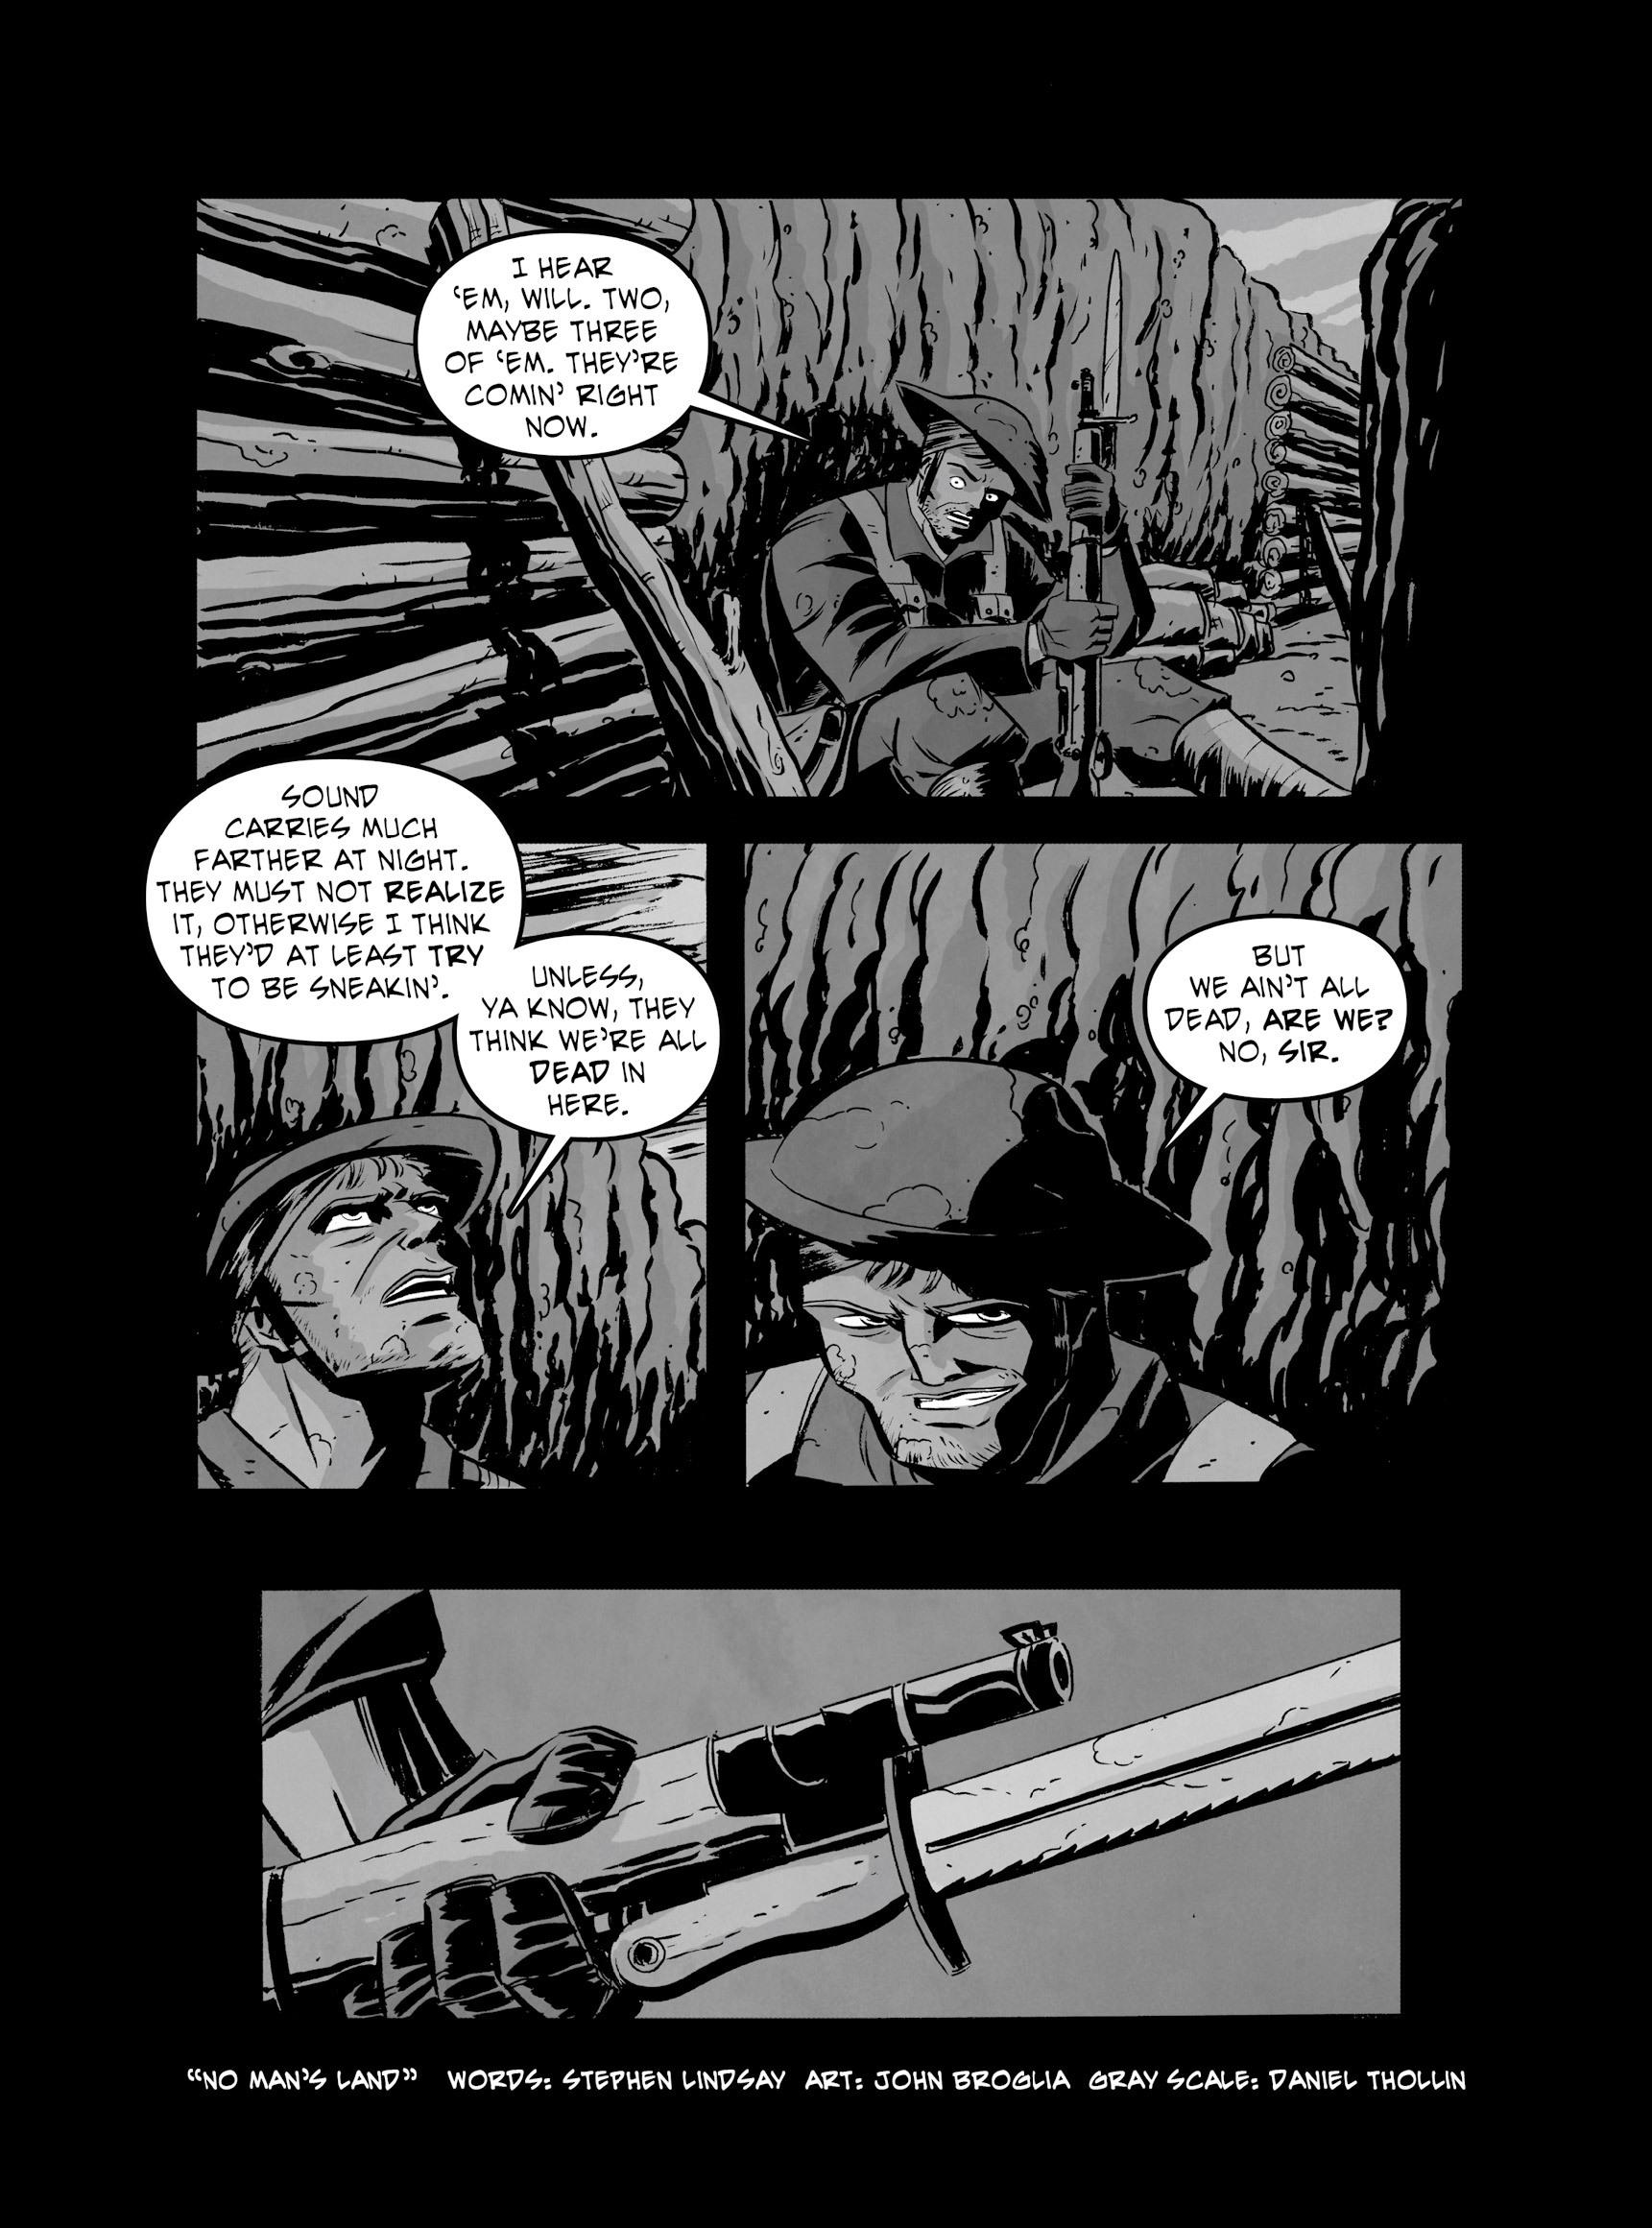 Read online FUBAR comic -  Issue #3 - 222